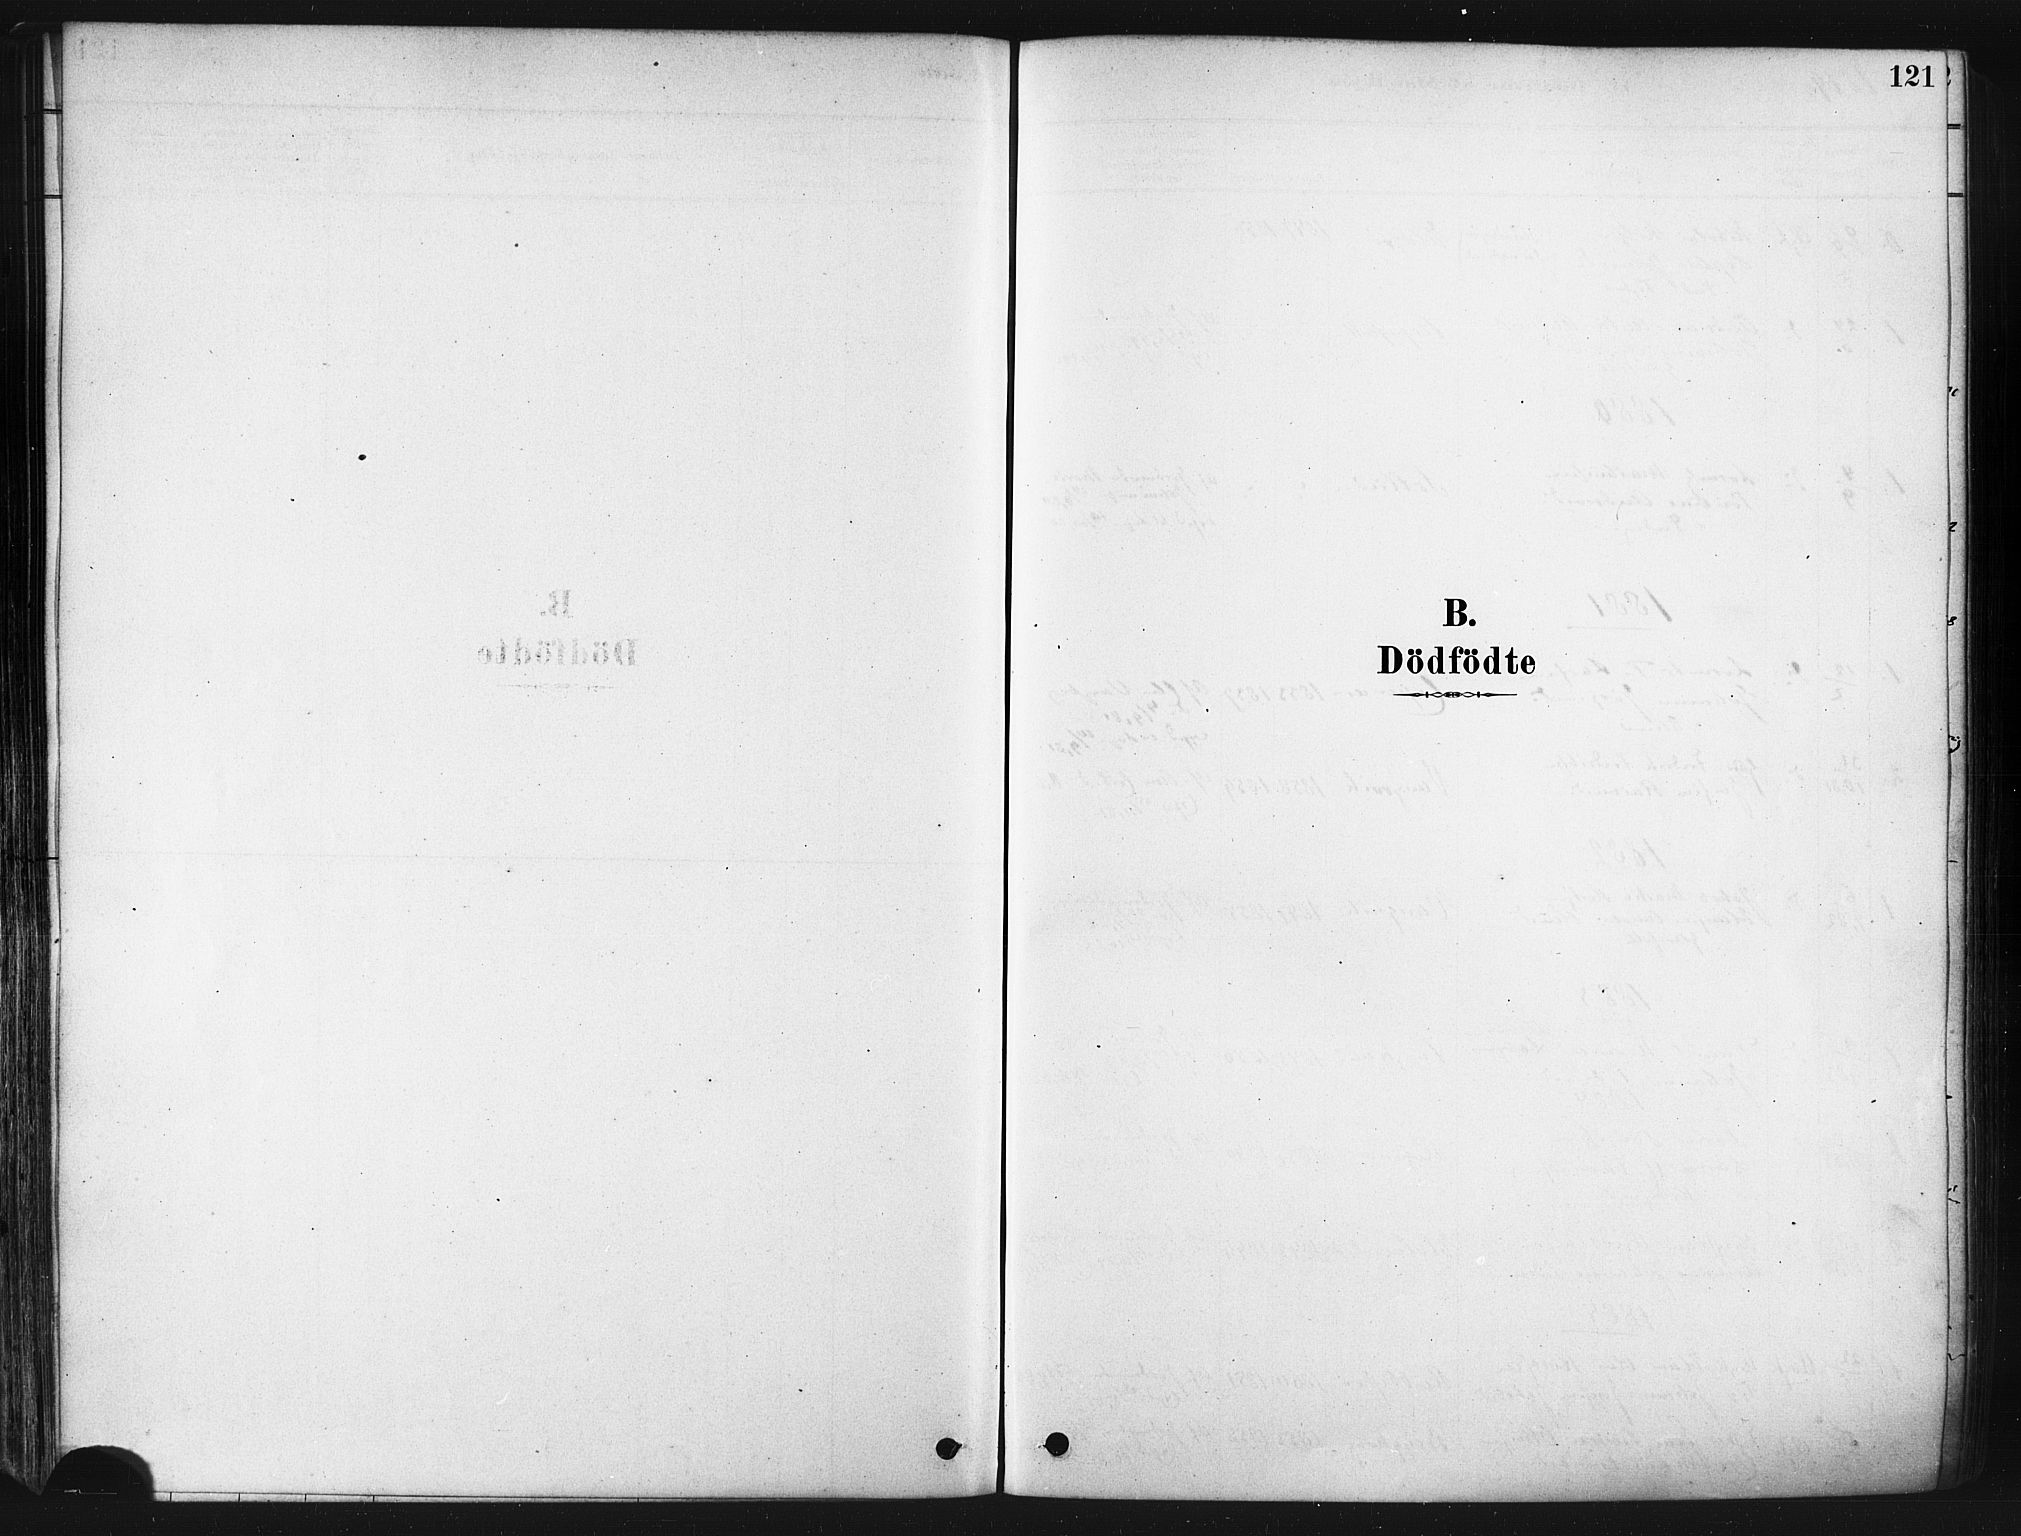 SATØ, Tranøy sokneprestkontor, I/Ia/Iaa/L0009kirke: Ministerialbok nr. 9, 1878-1904, s. 121